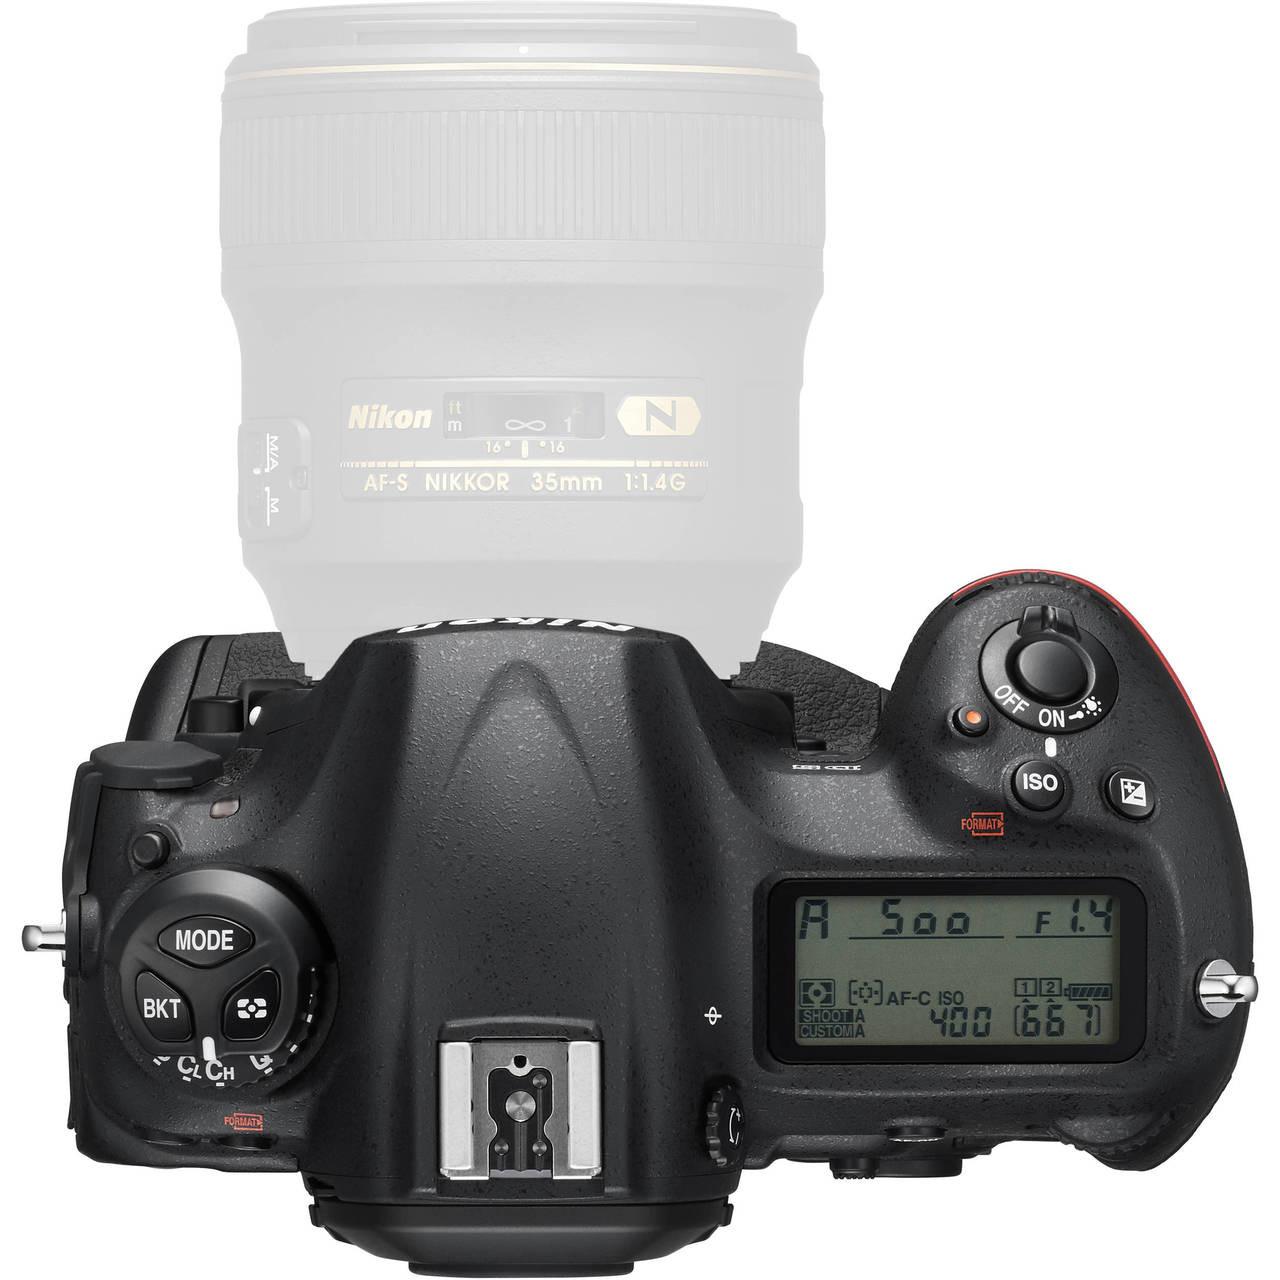 Nikon D5 Body with Dual CF Slots Top